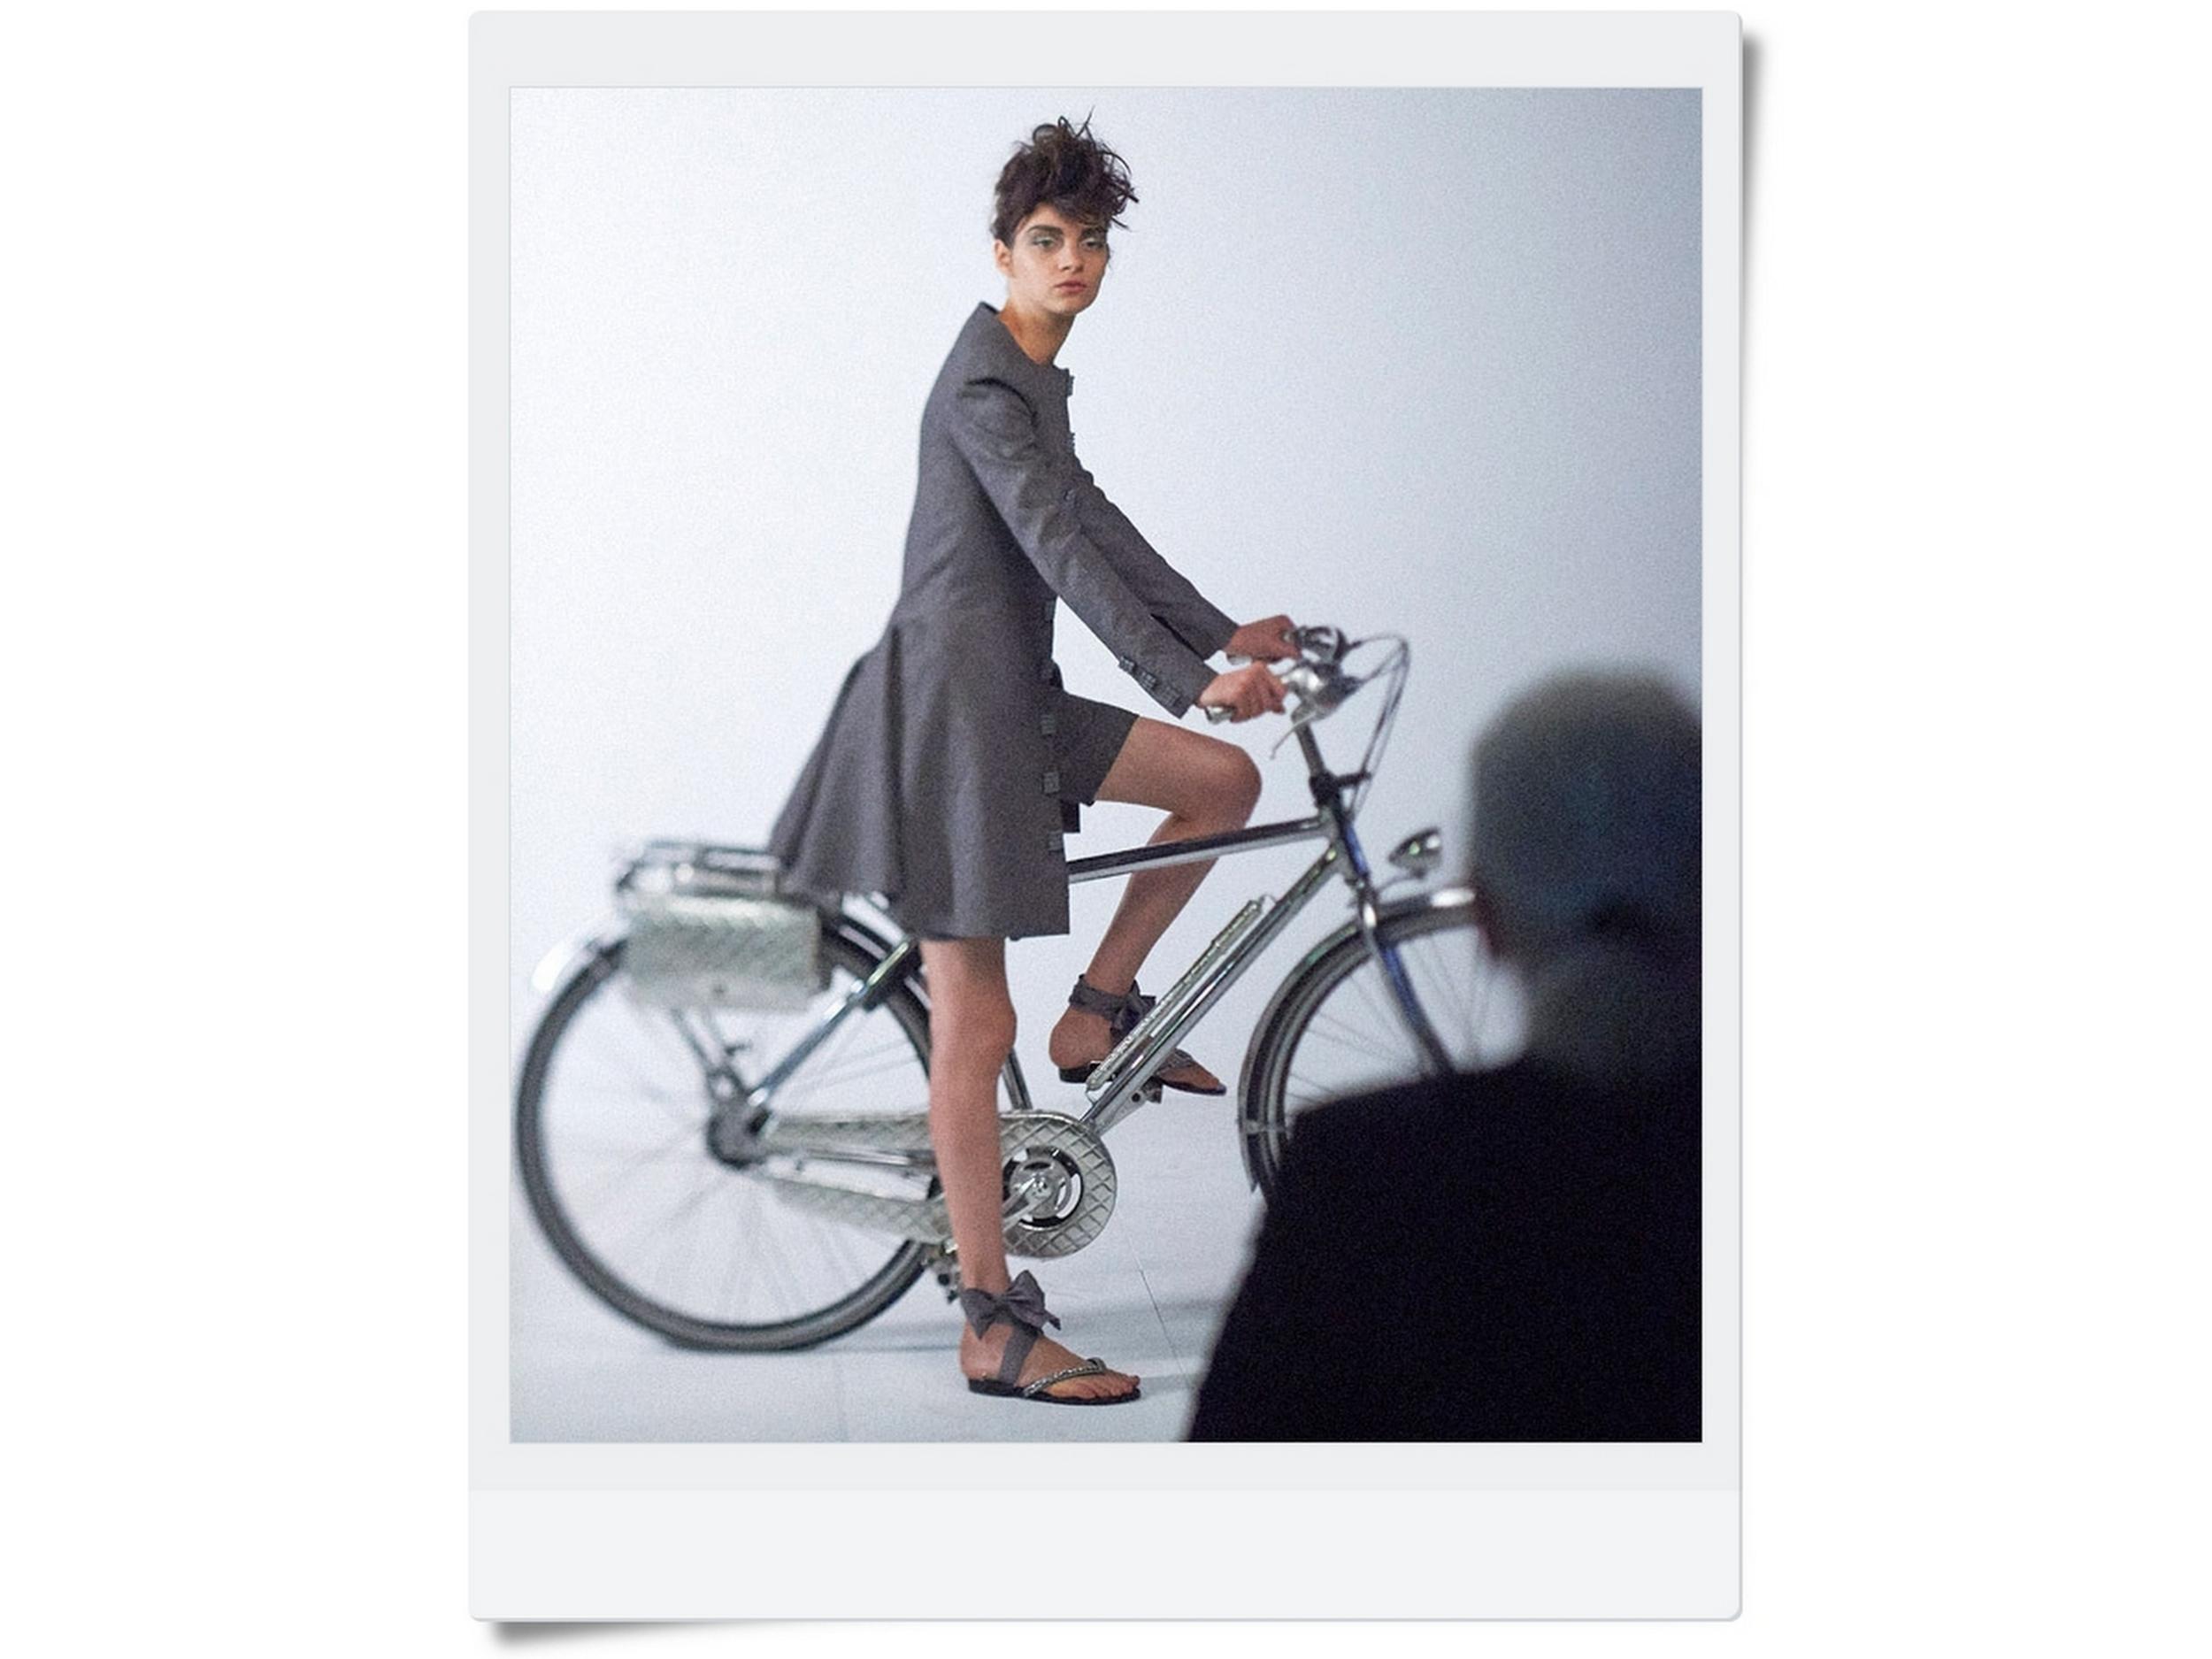 chanel-couture-lookbook-karl-lagerfeld.jpg